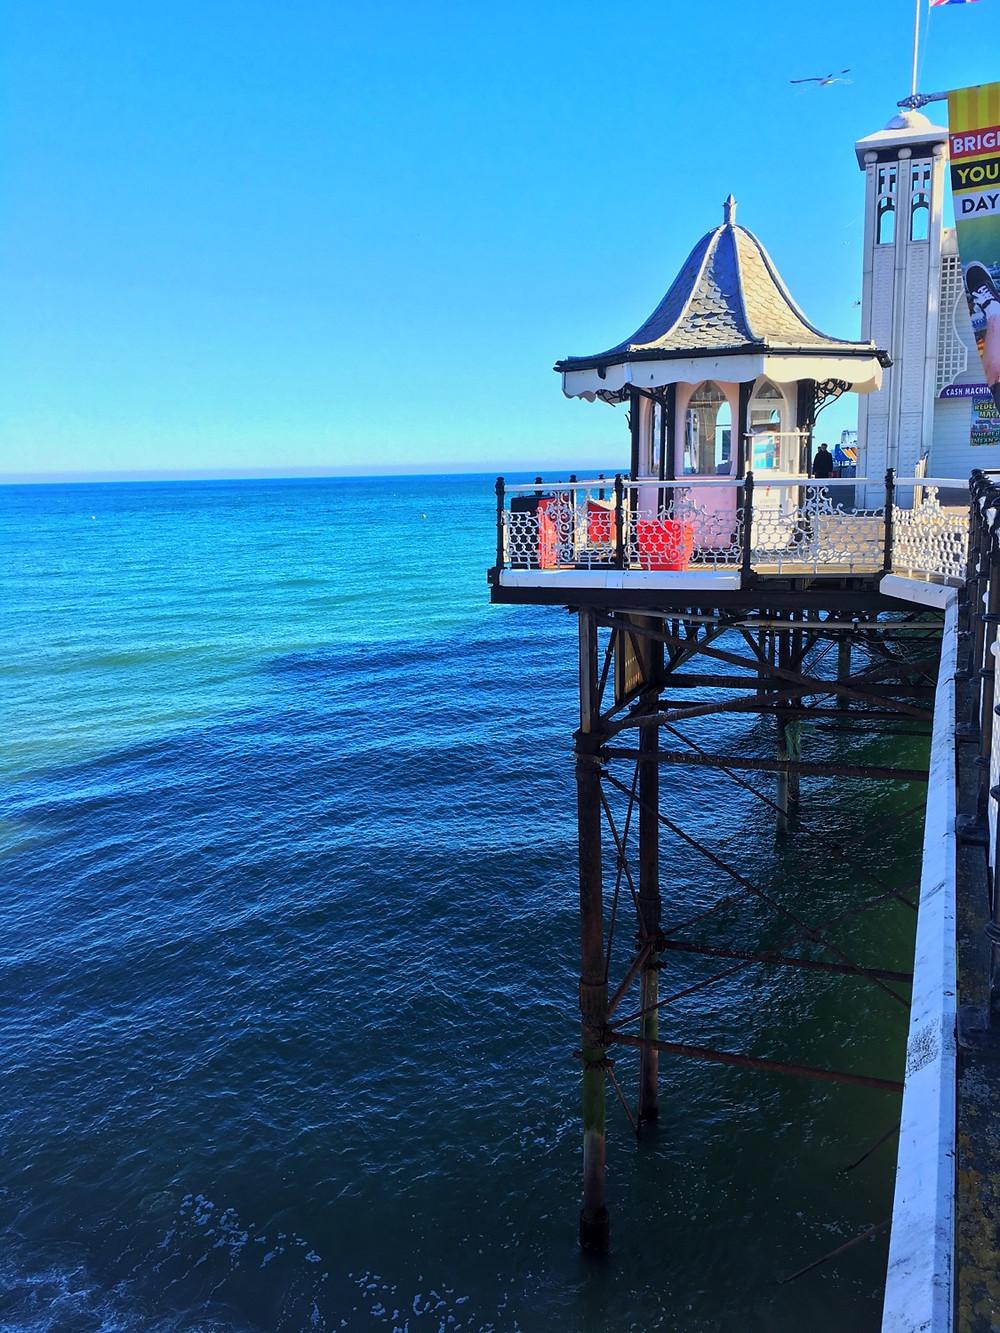 Dettaglio Brighton Pier